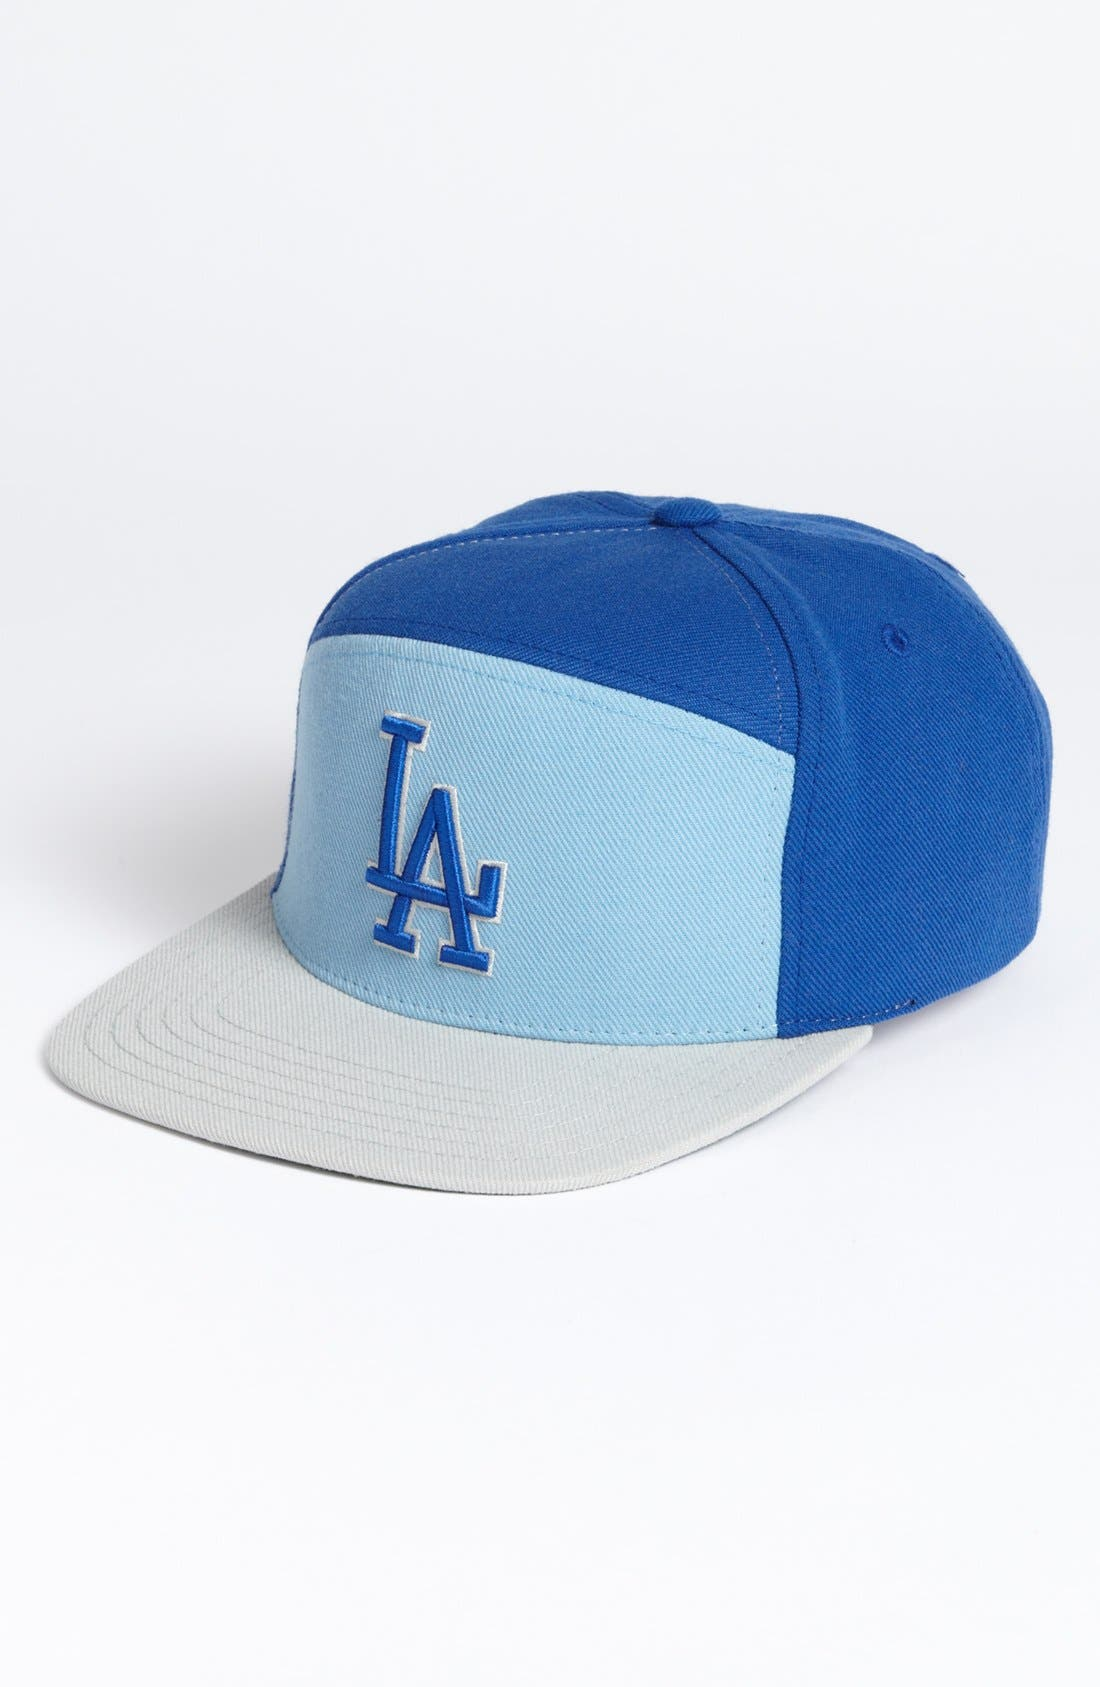 Main Image - American Needle 'Los Angeles Dodgers - Ante' Snapback Ball Cap